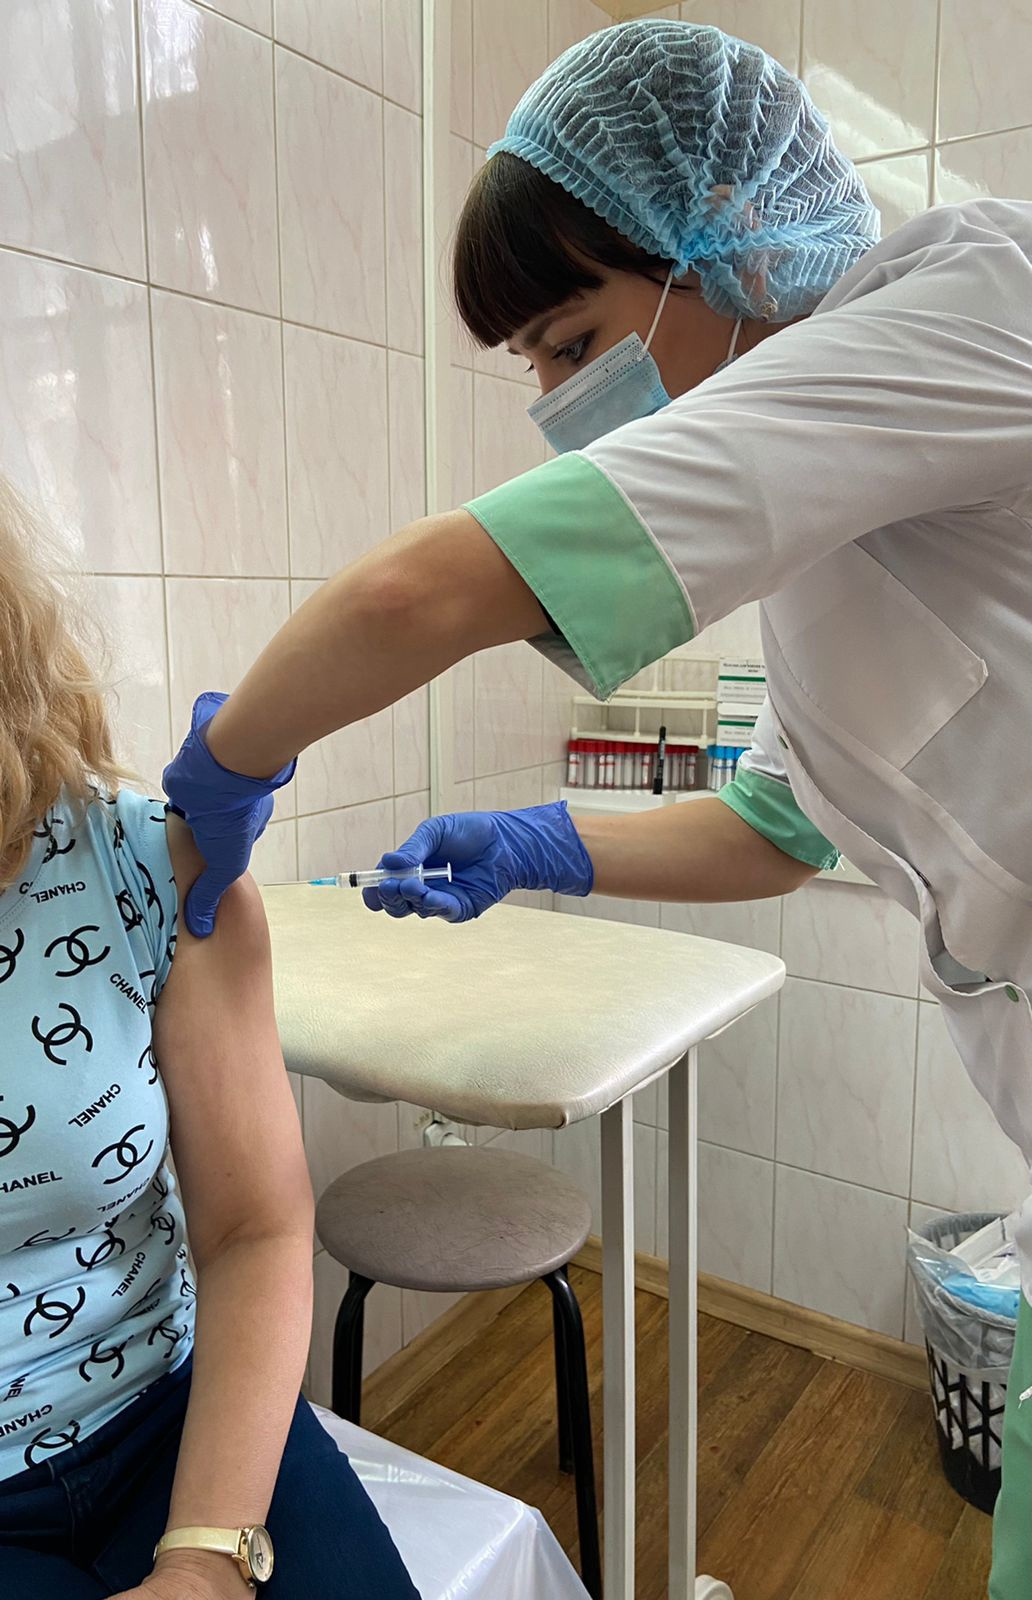 Эряви-арась сыретненень вакцинась?